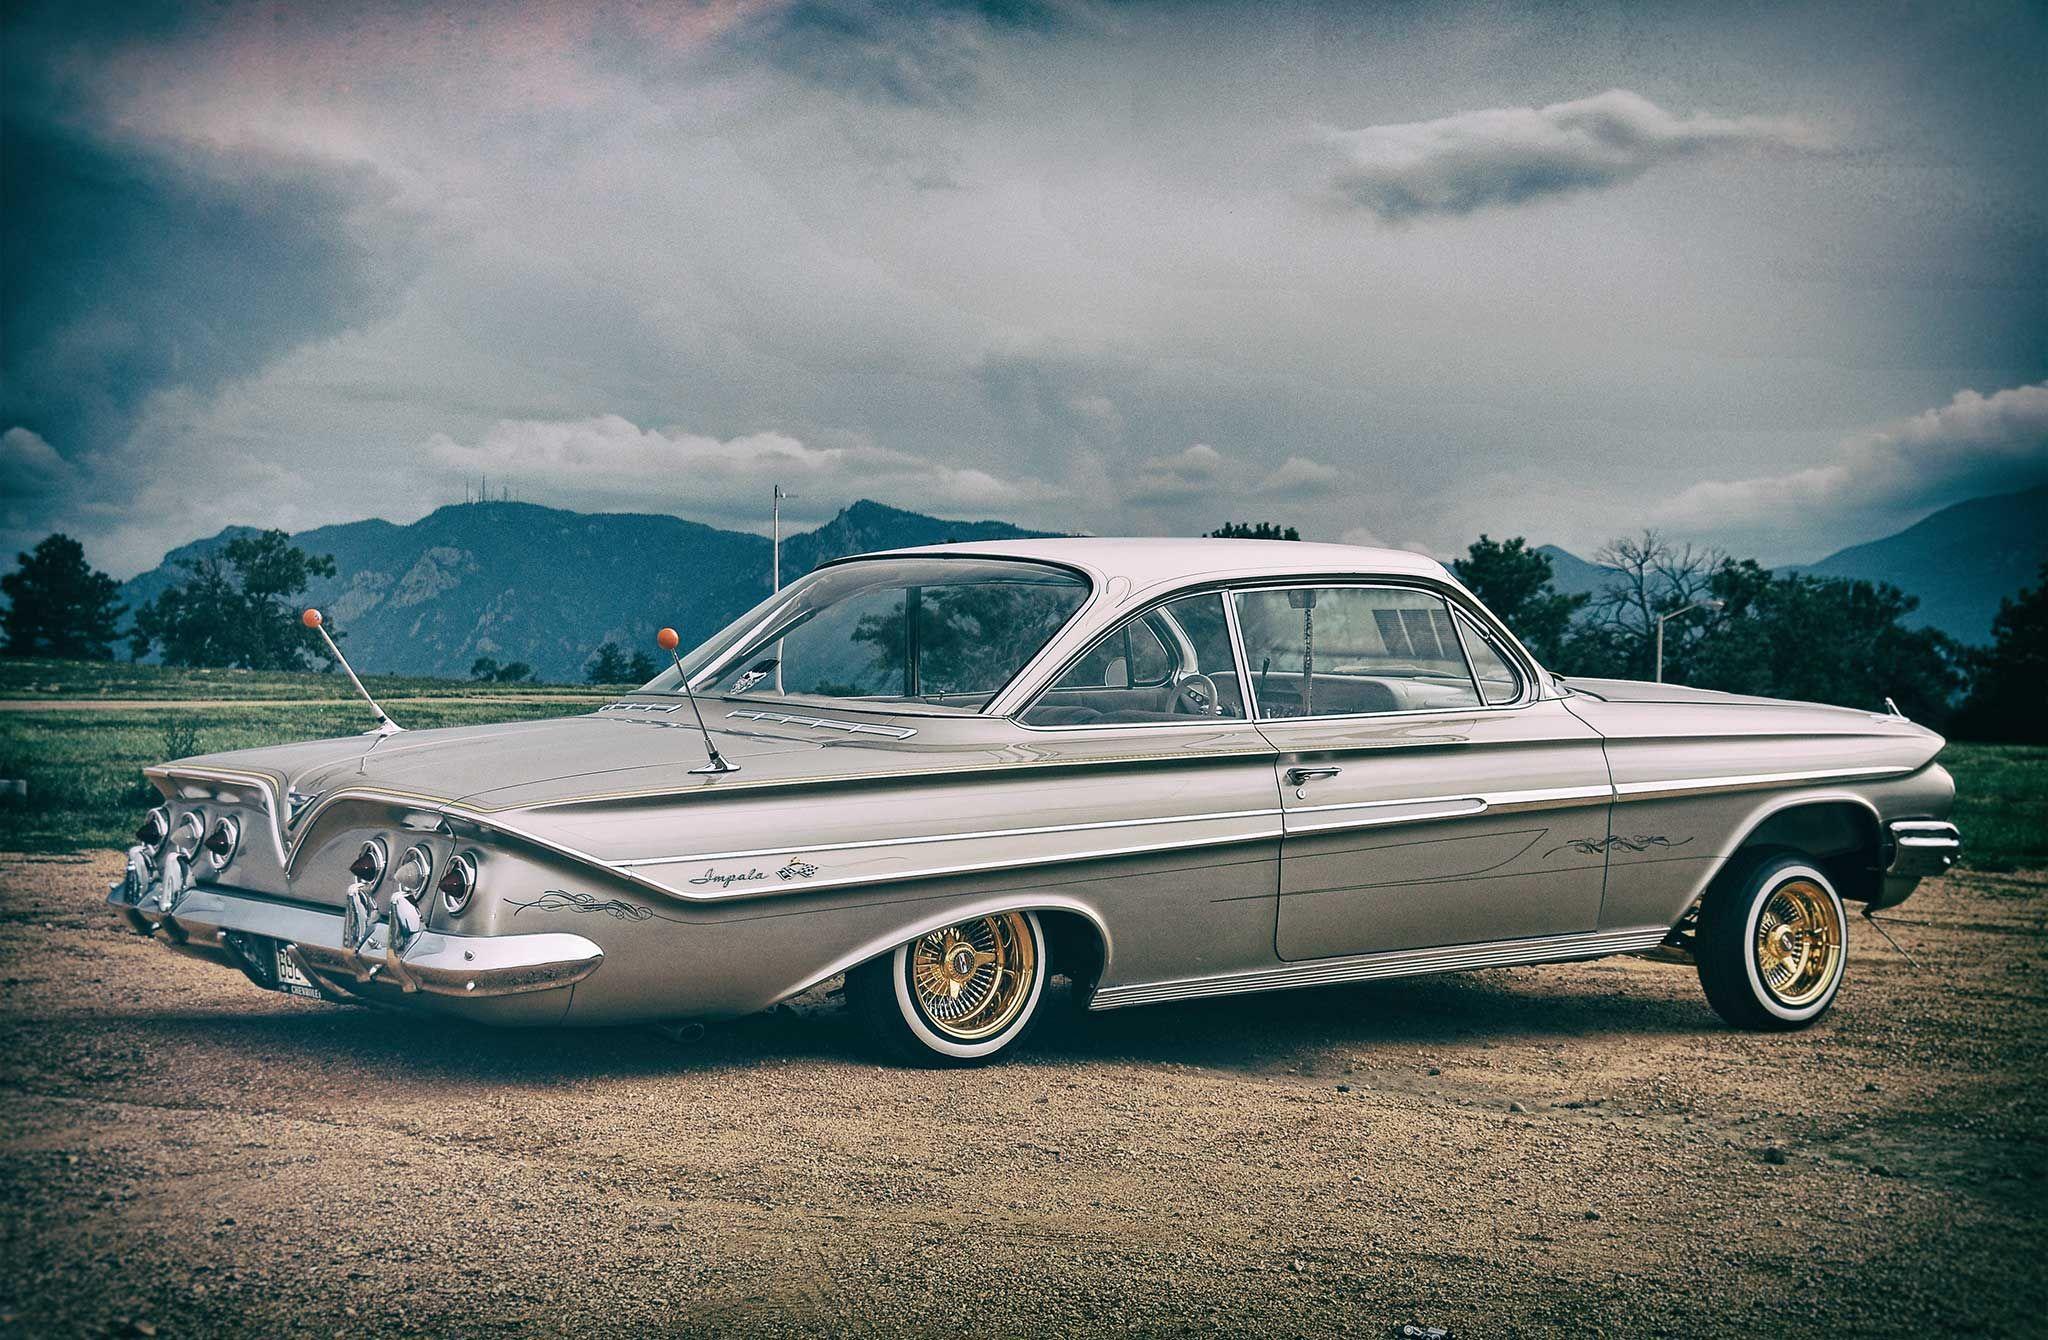 medium resolution of 1961 chevrolet impala precious metals found a 61 impala pot of gold in colorado